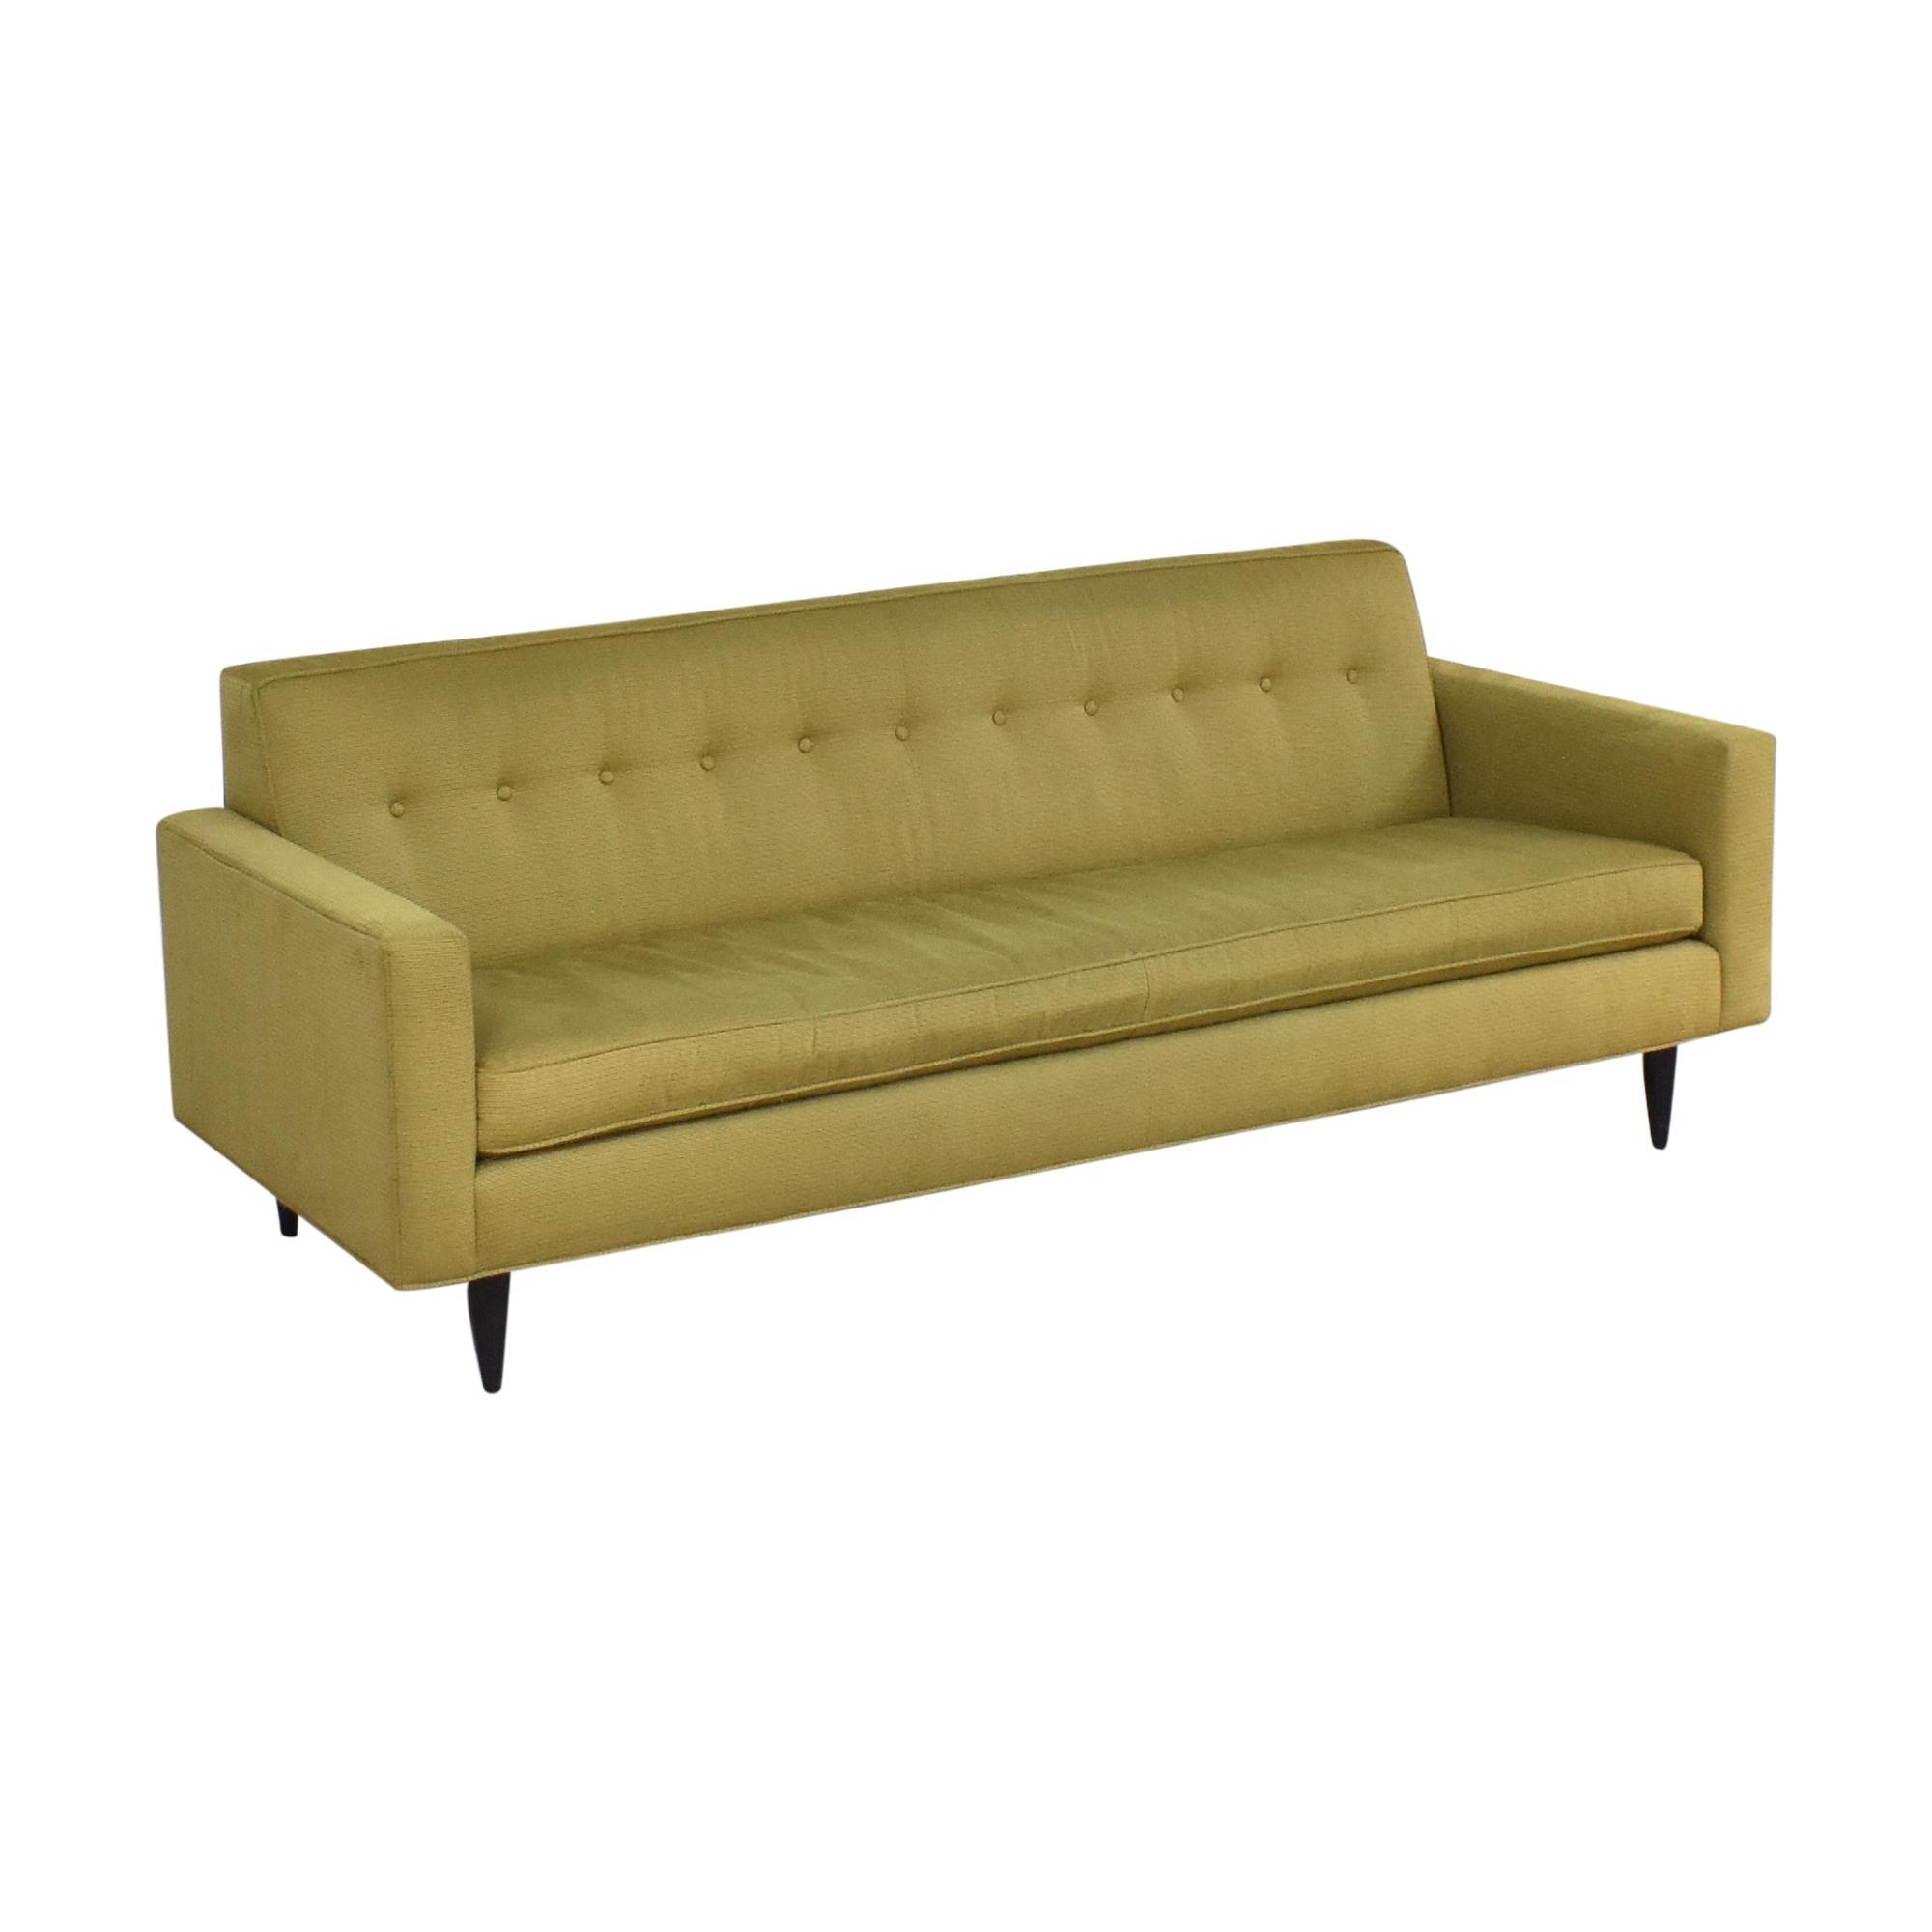 buy Design Within Reach Design Within Reach Bantam Tufted Sofa online